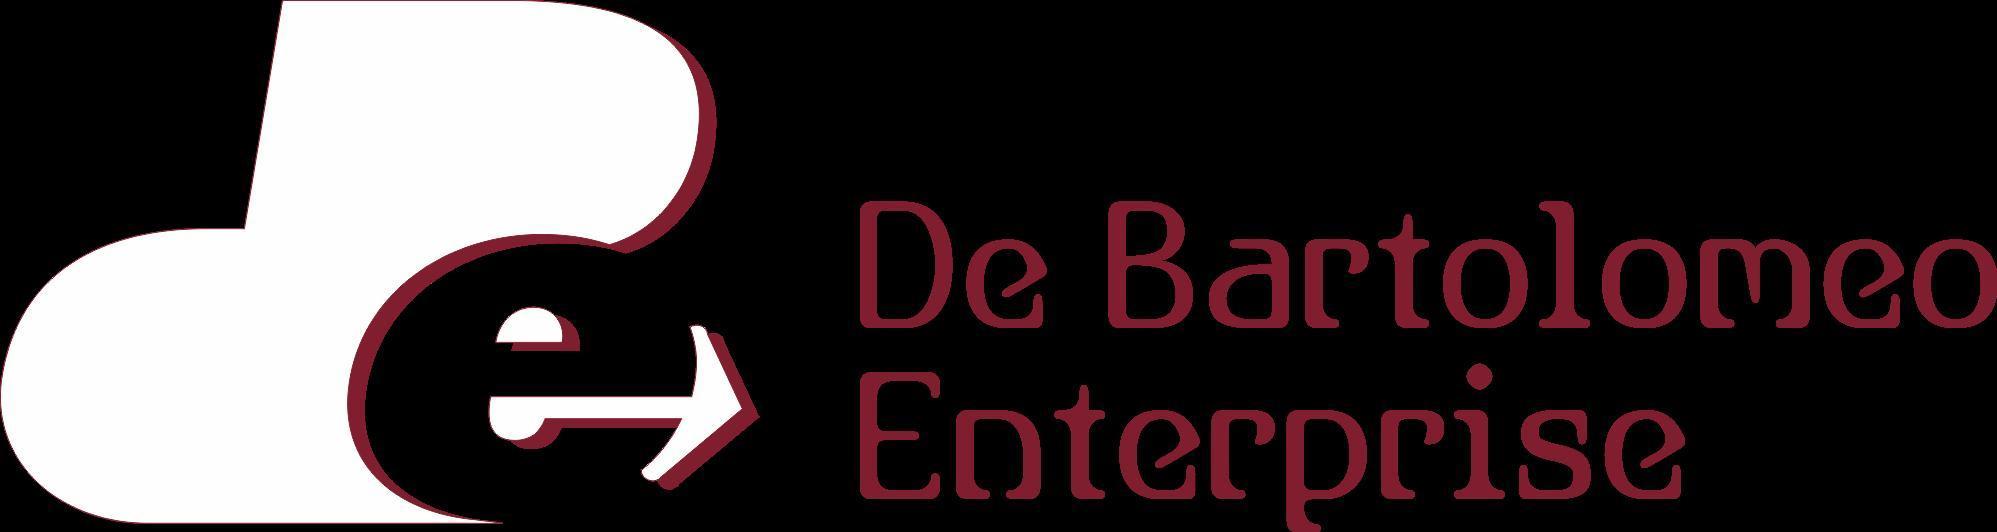 bari vendita quart: madonnella de-bartolomeo-enterprise